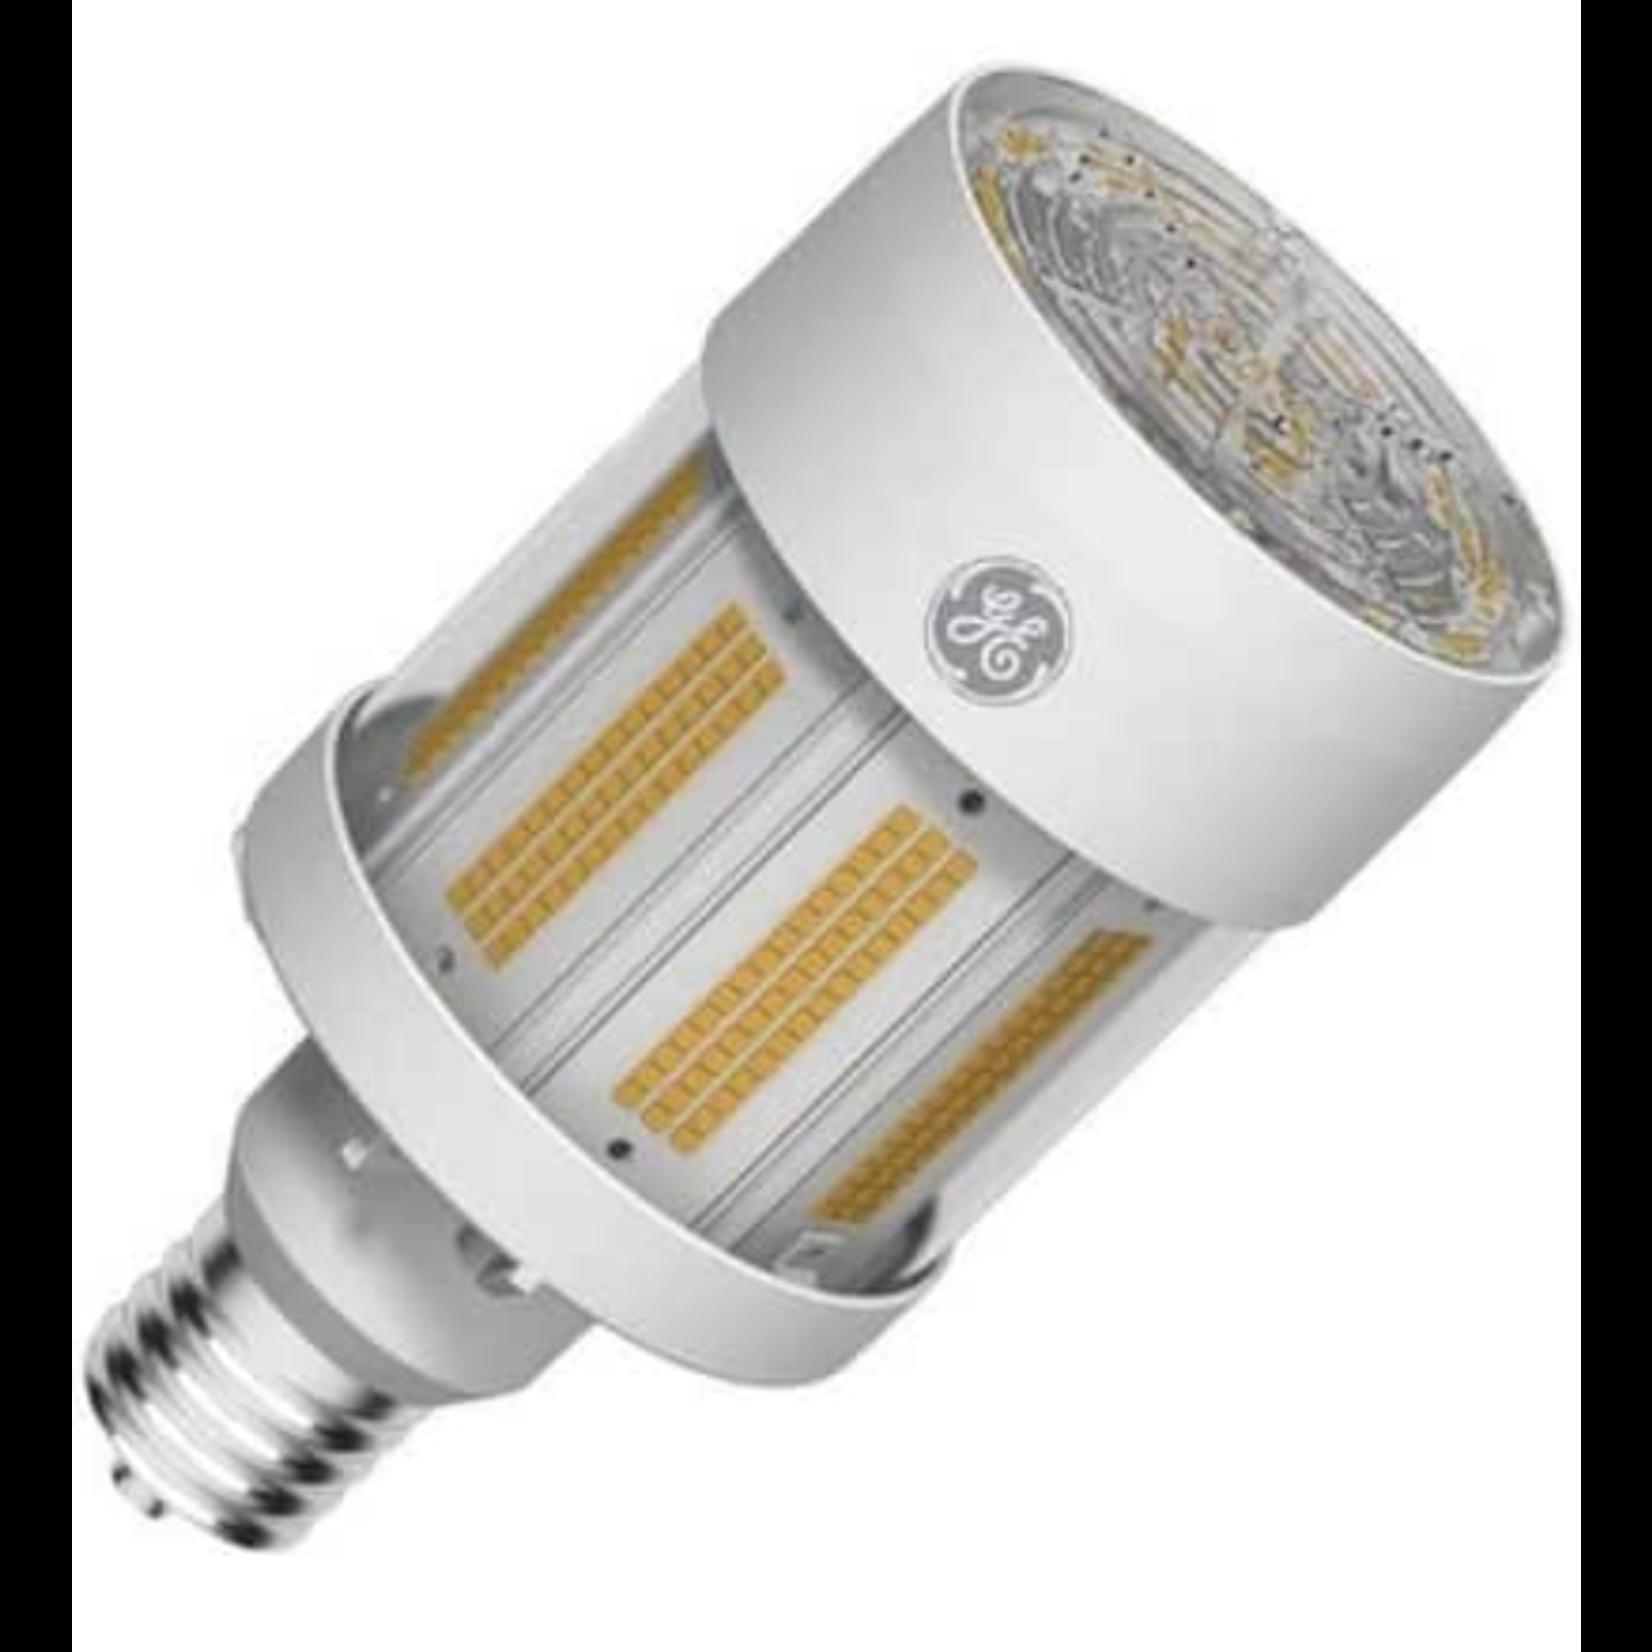 10272 GE 130-Watt EQ Warm White LED Light Bulb